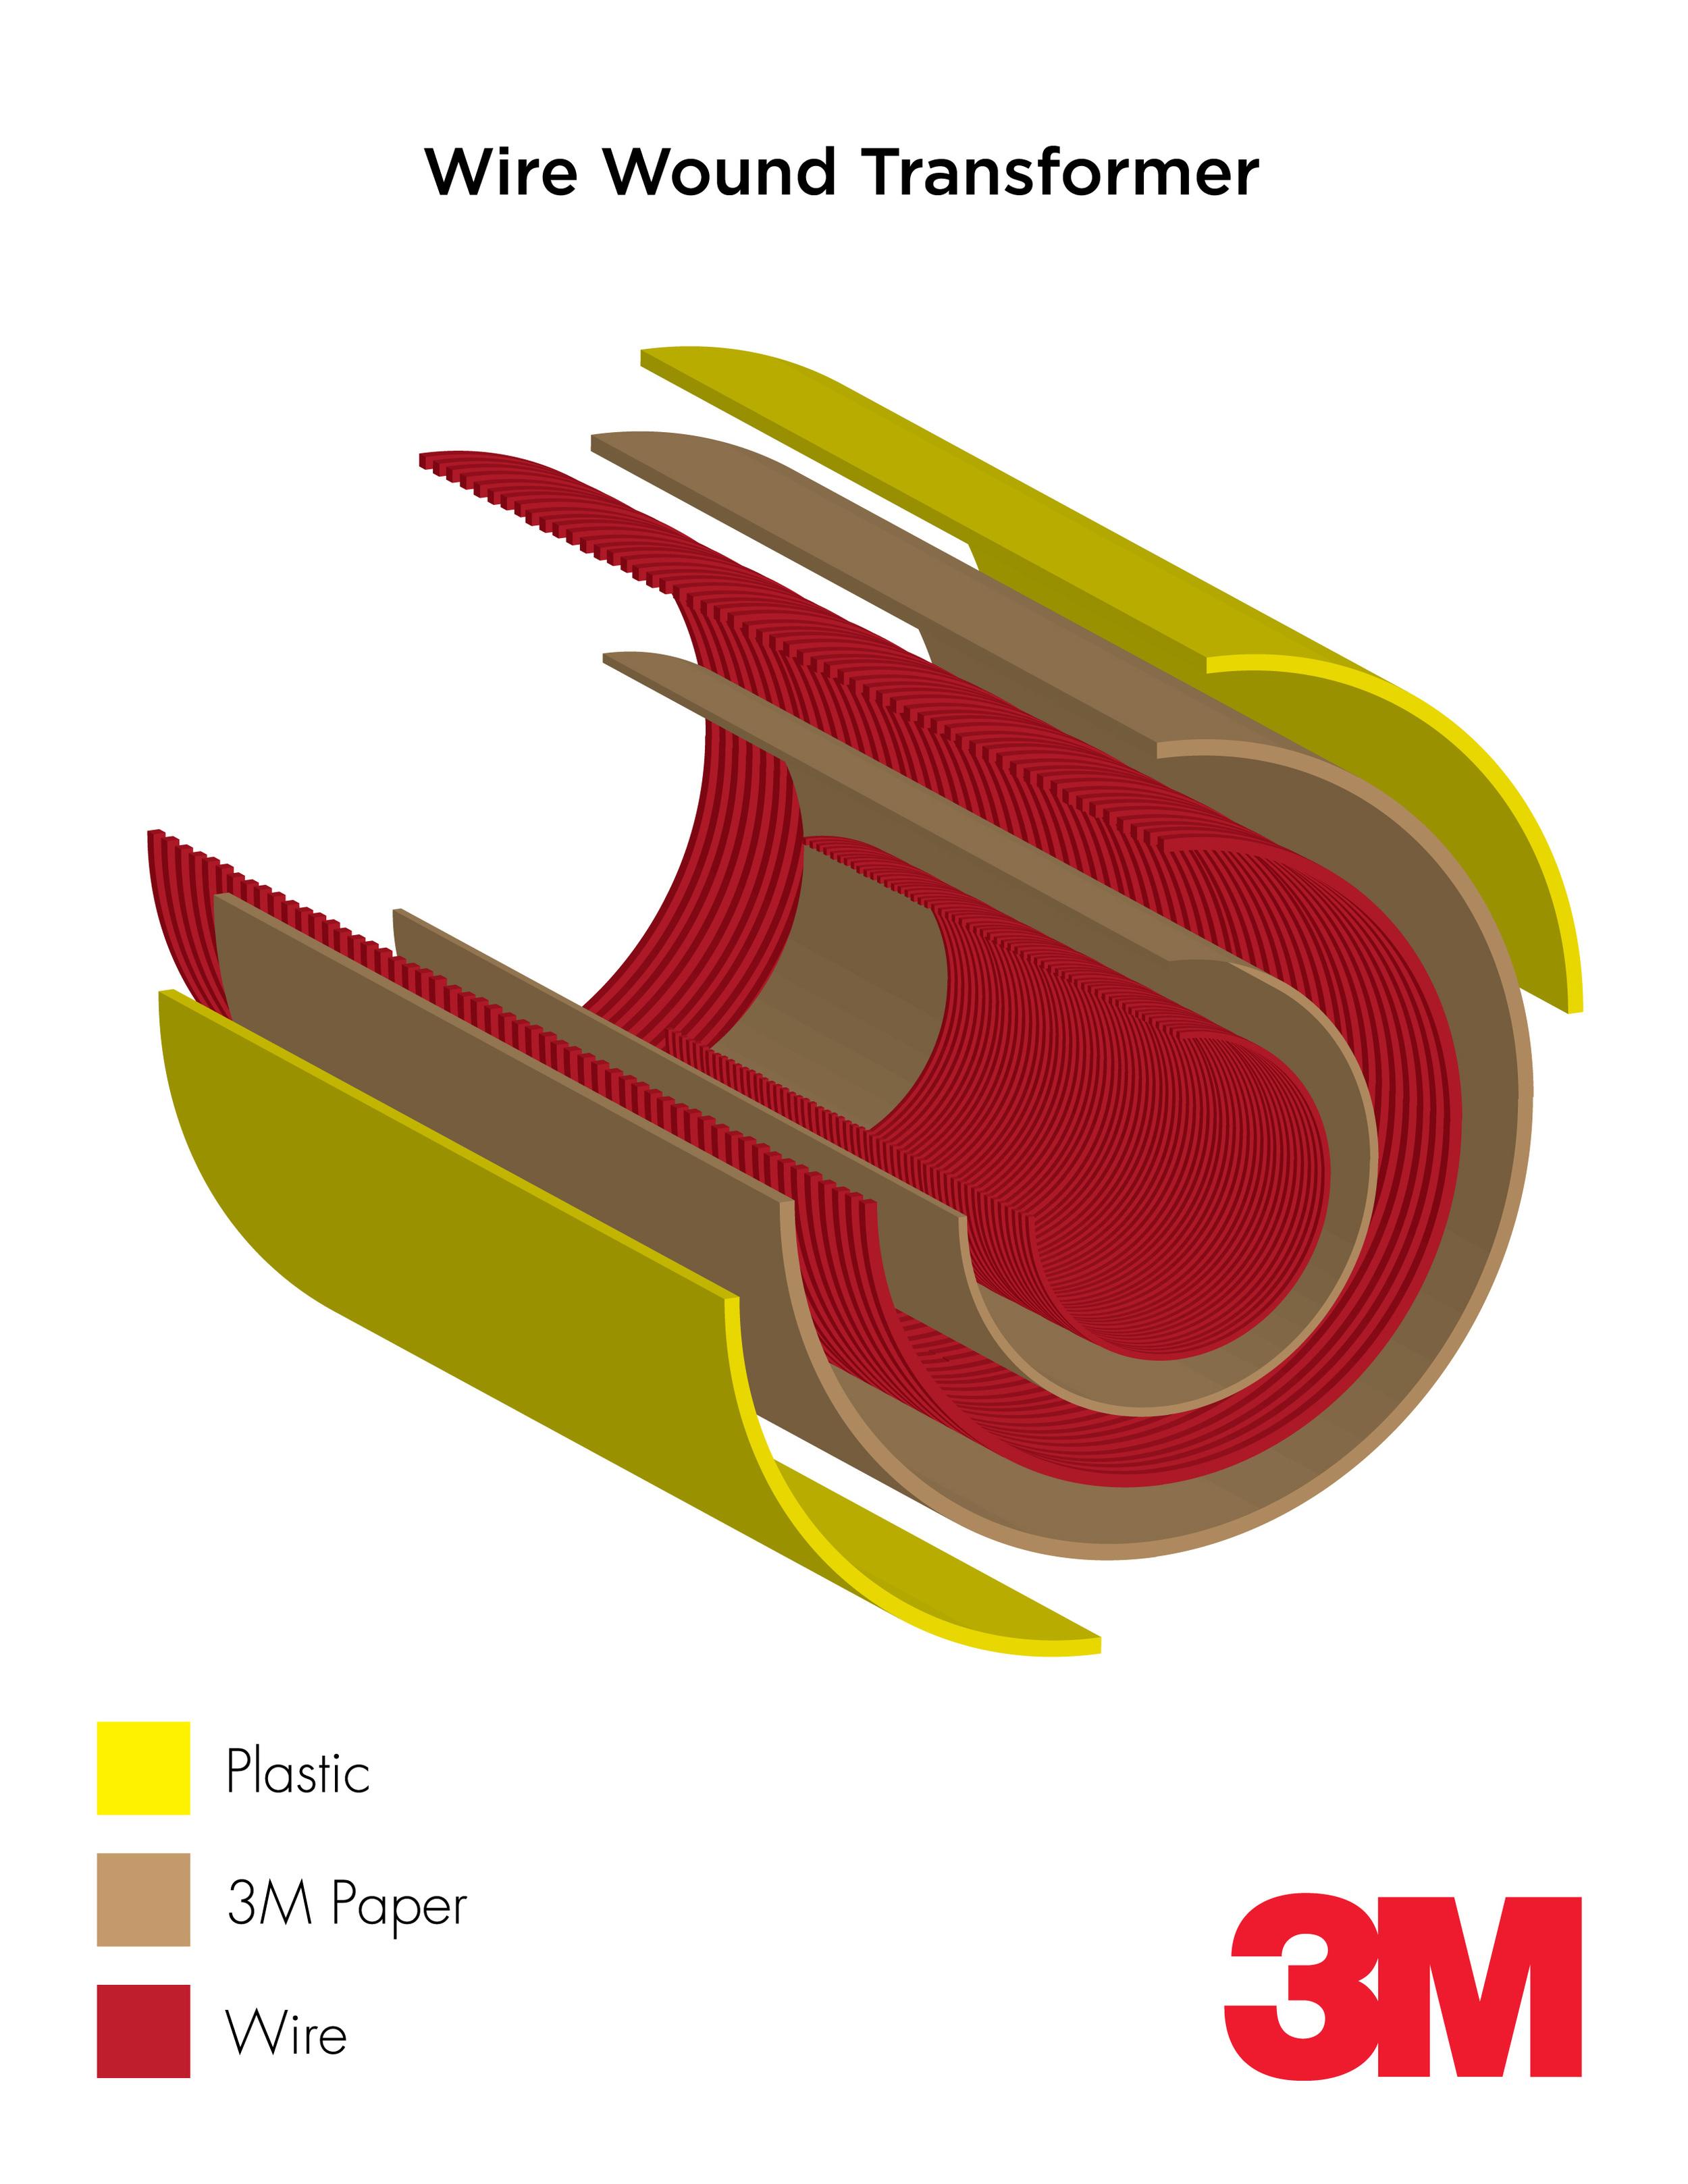 3M Technical Illustration